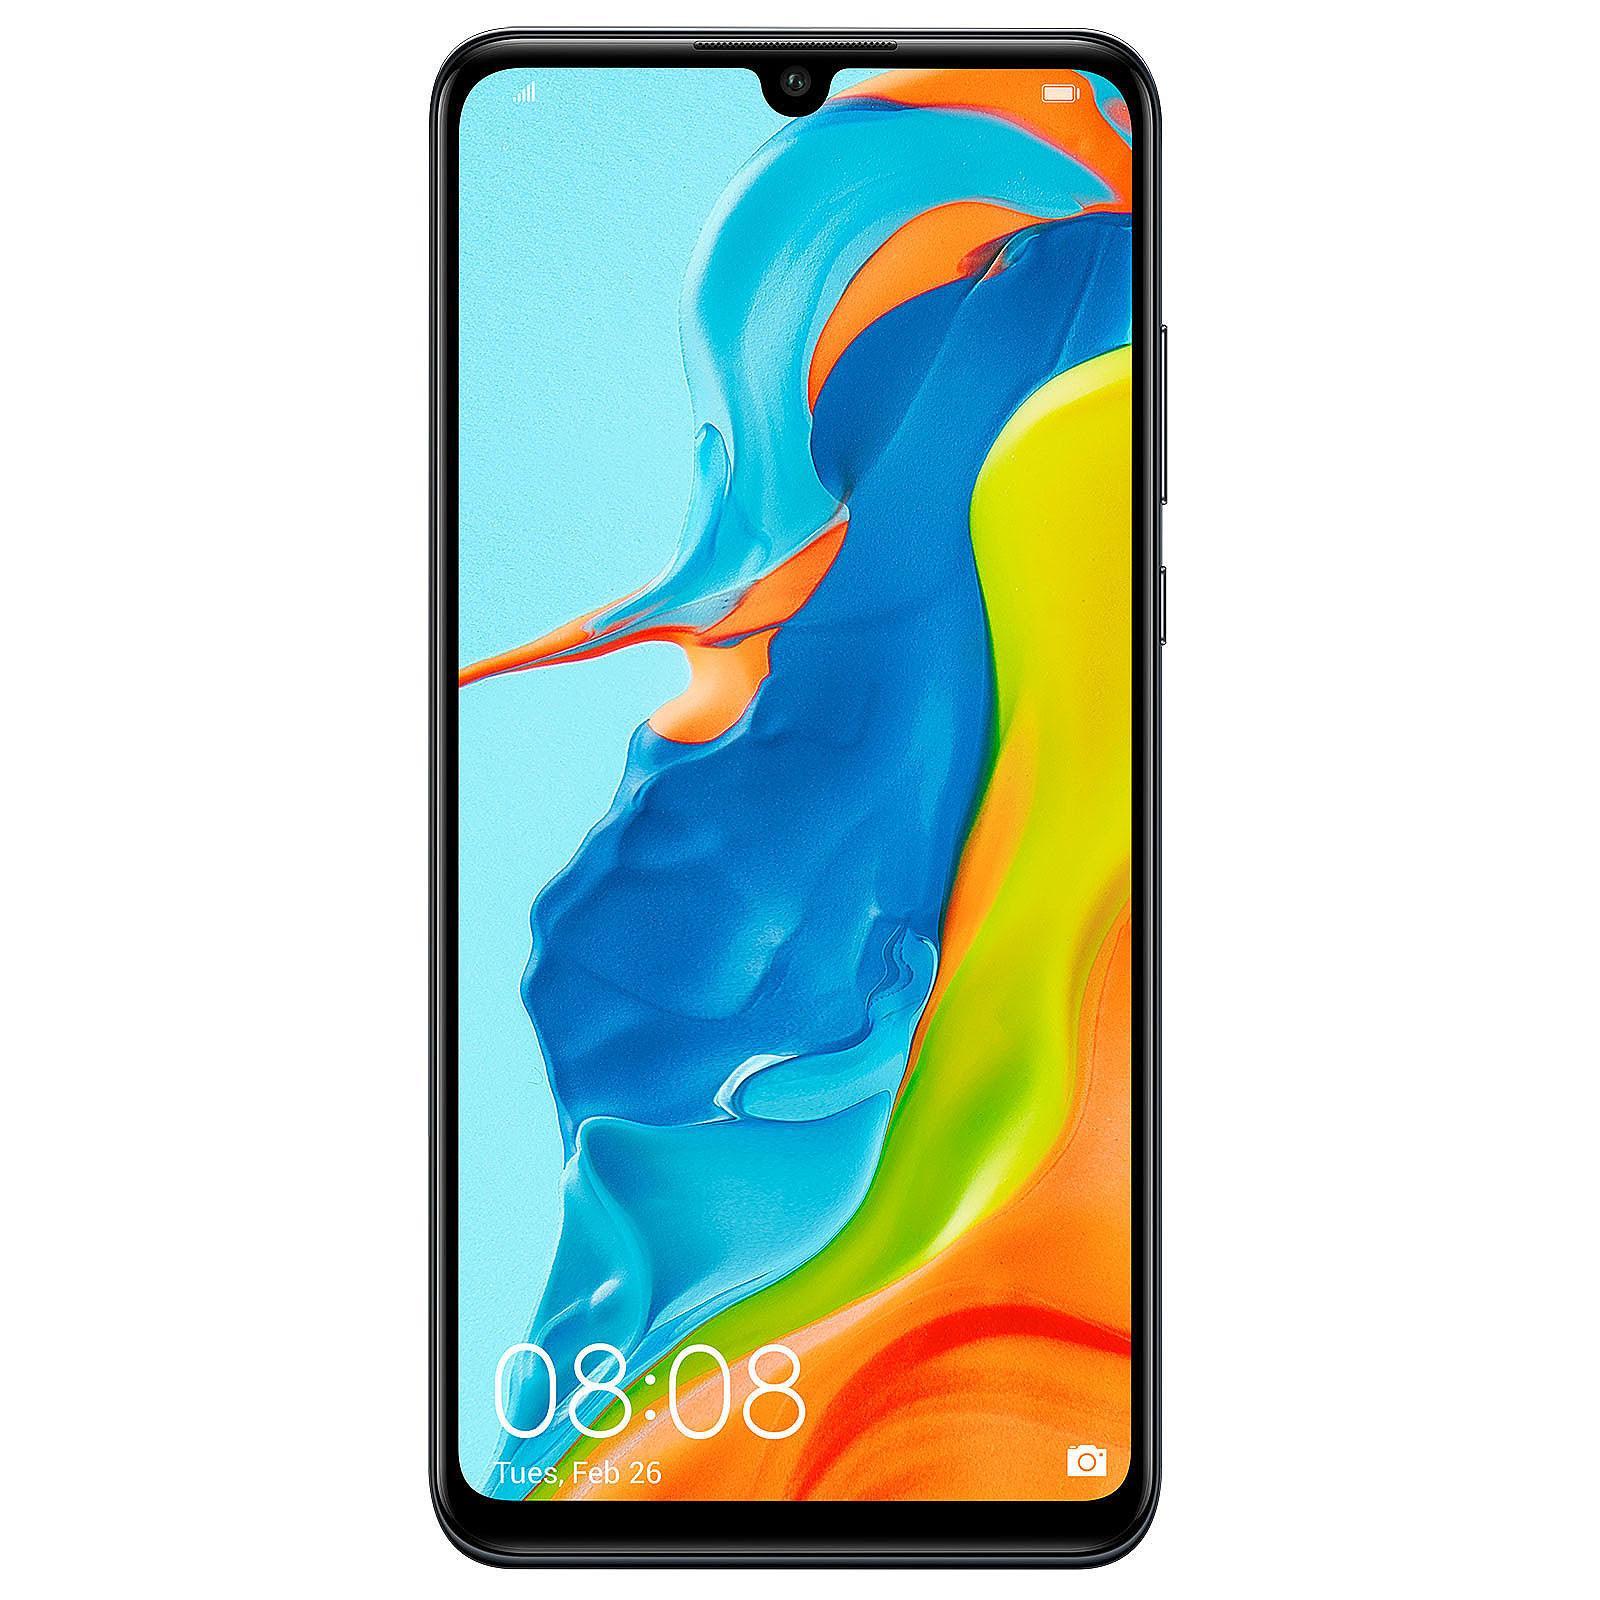 Huawei P30 Lite 128Go Black - Téléphonie Huawei - Cybertek.fr - 0